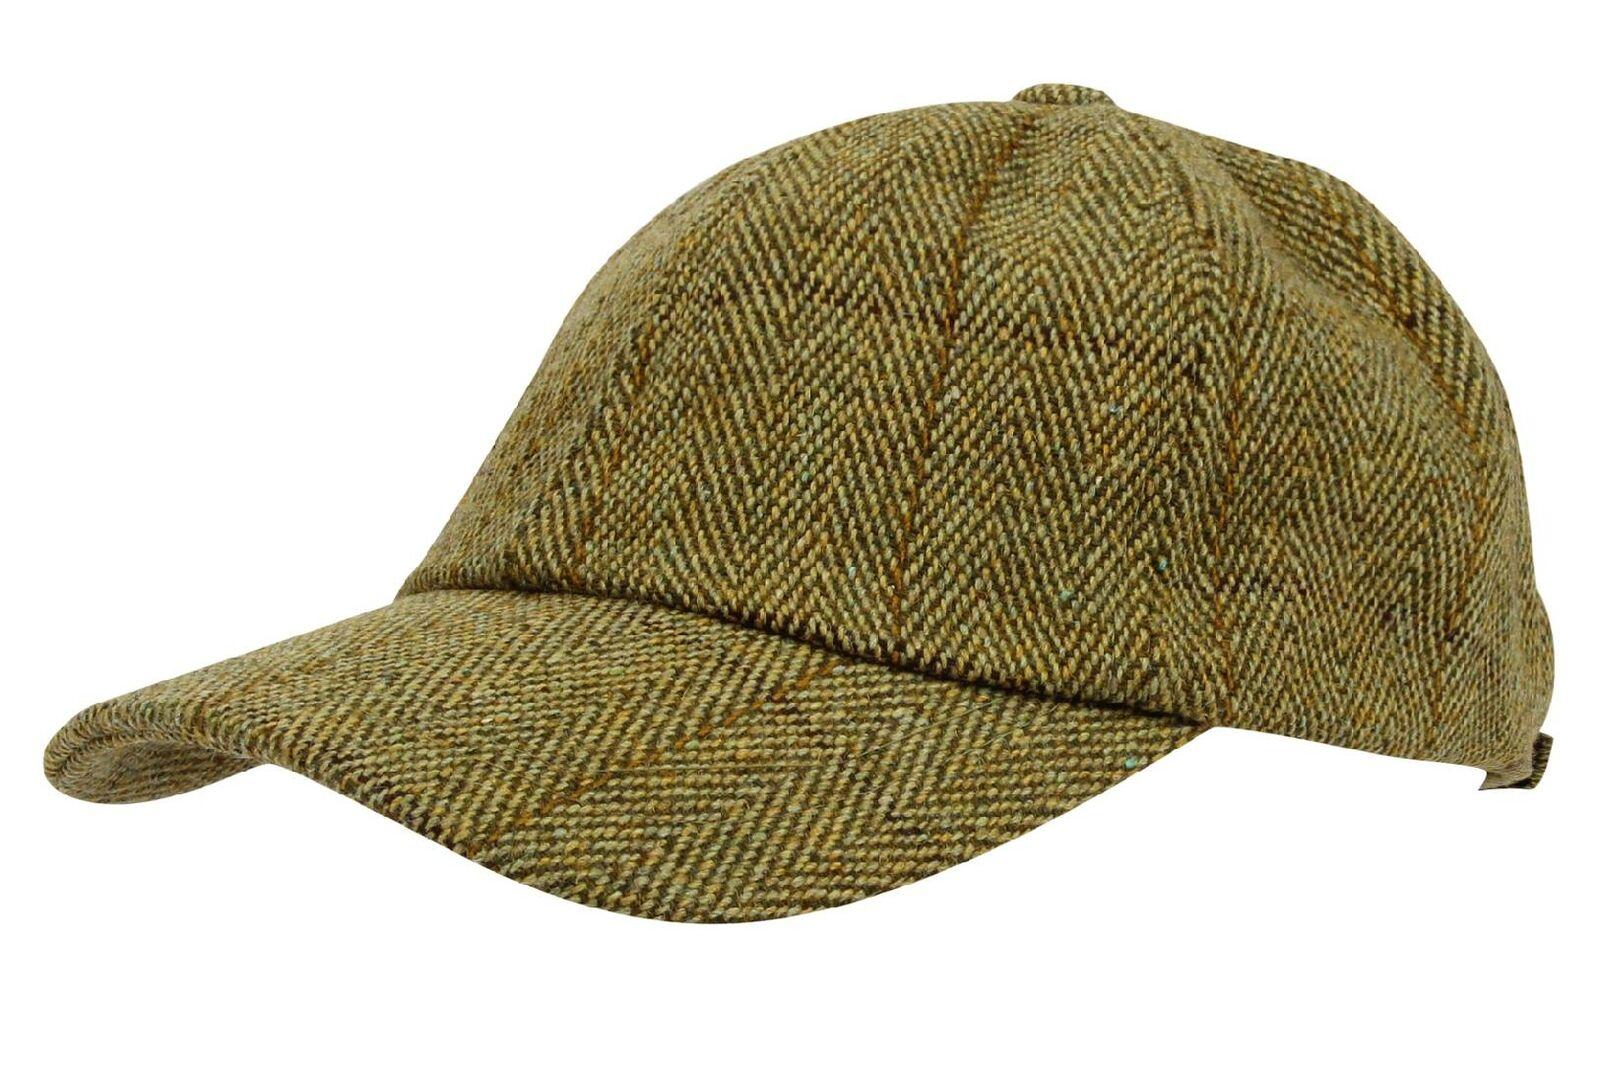 Mens Tweed Baseball Cap Teflon Coated Derby Wool Waterproof New Fishing  Hunting 8912601b48a